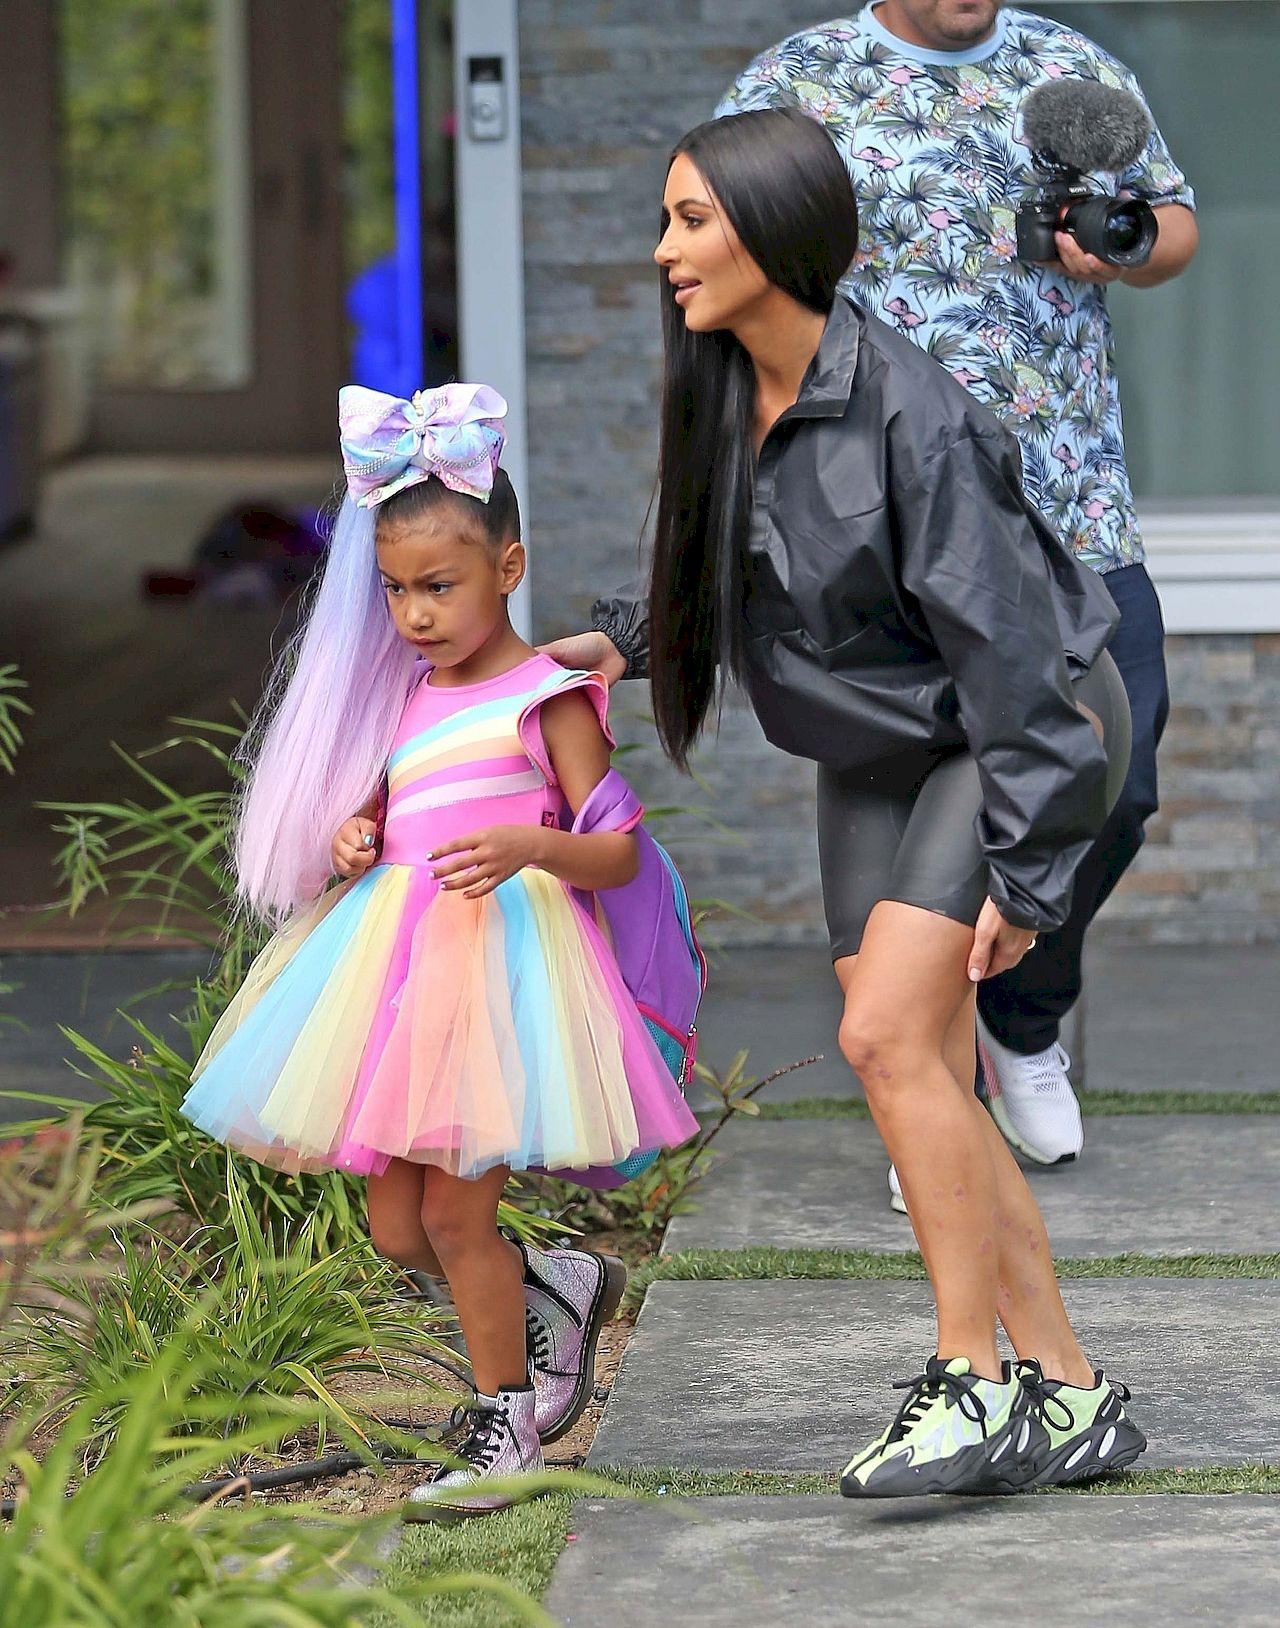 *EXCLUSIVE* North West and Kim Kardashian meet Youtube Star JoJo Siwa ahead of video collaboration **WEB MUST CALL FOR PRICING** Kim Kardashian, North West